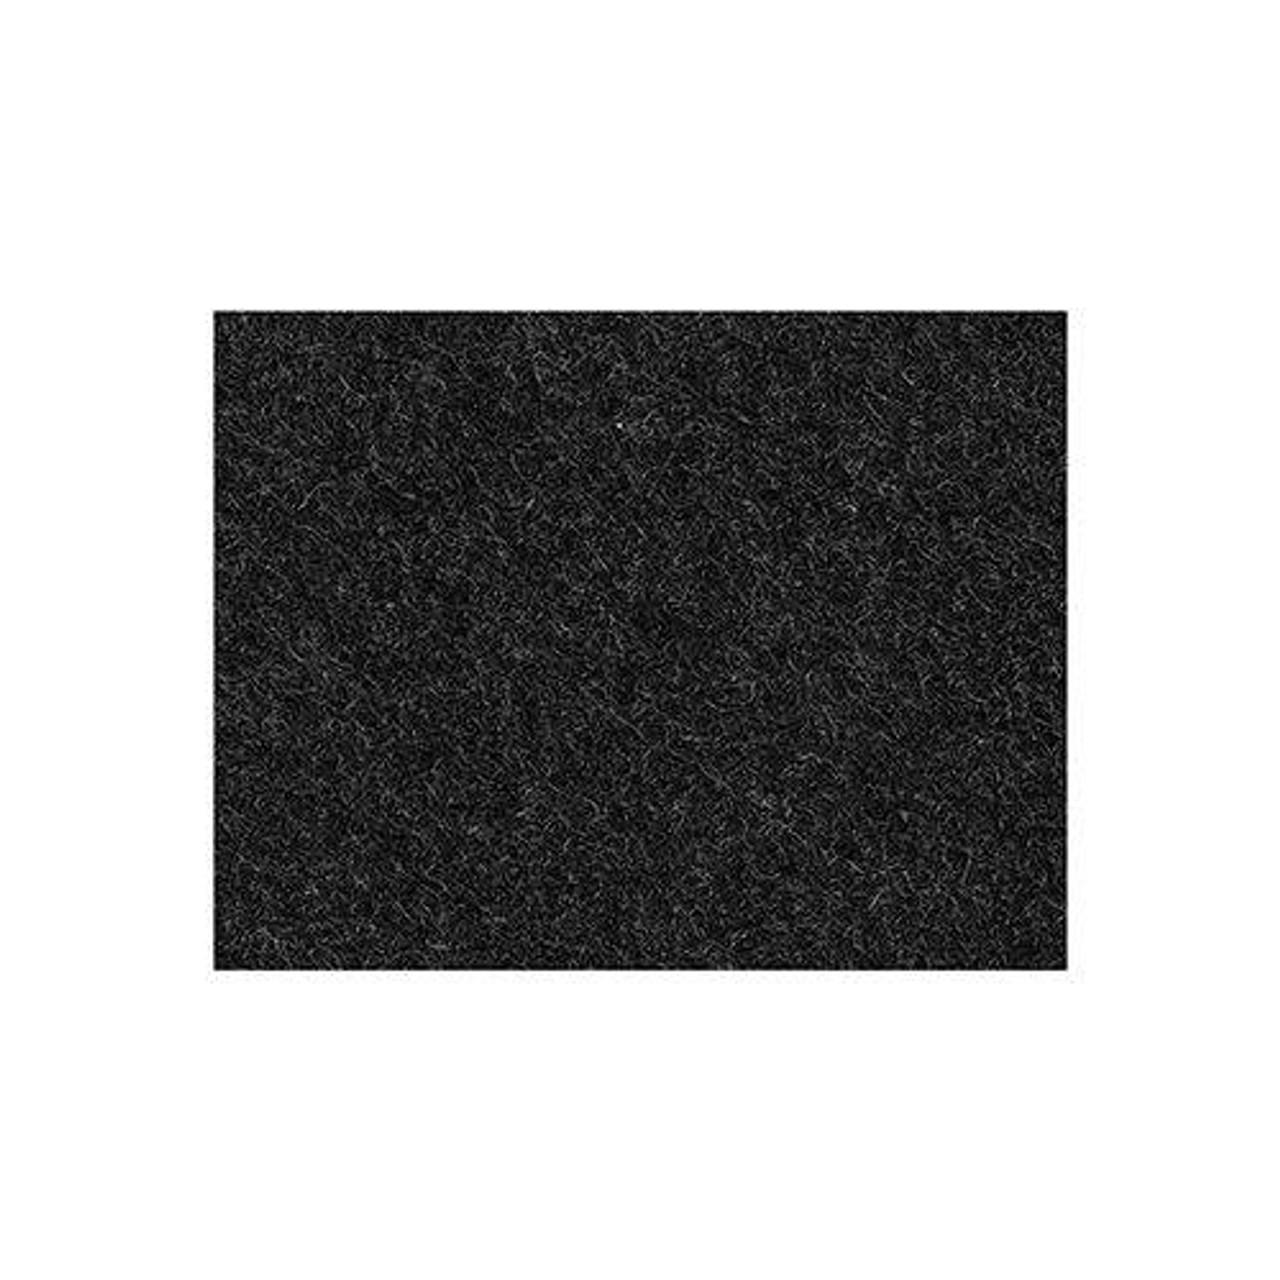 "EZ-Flex Carpet Roll 6' x 42' x 1 3/8"""